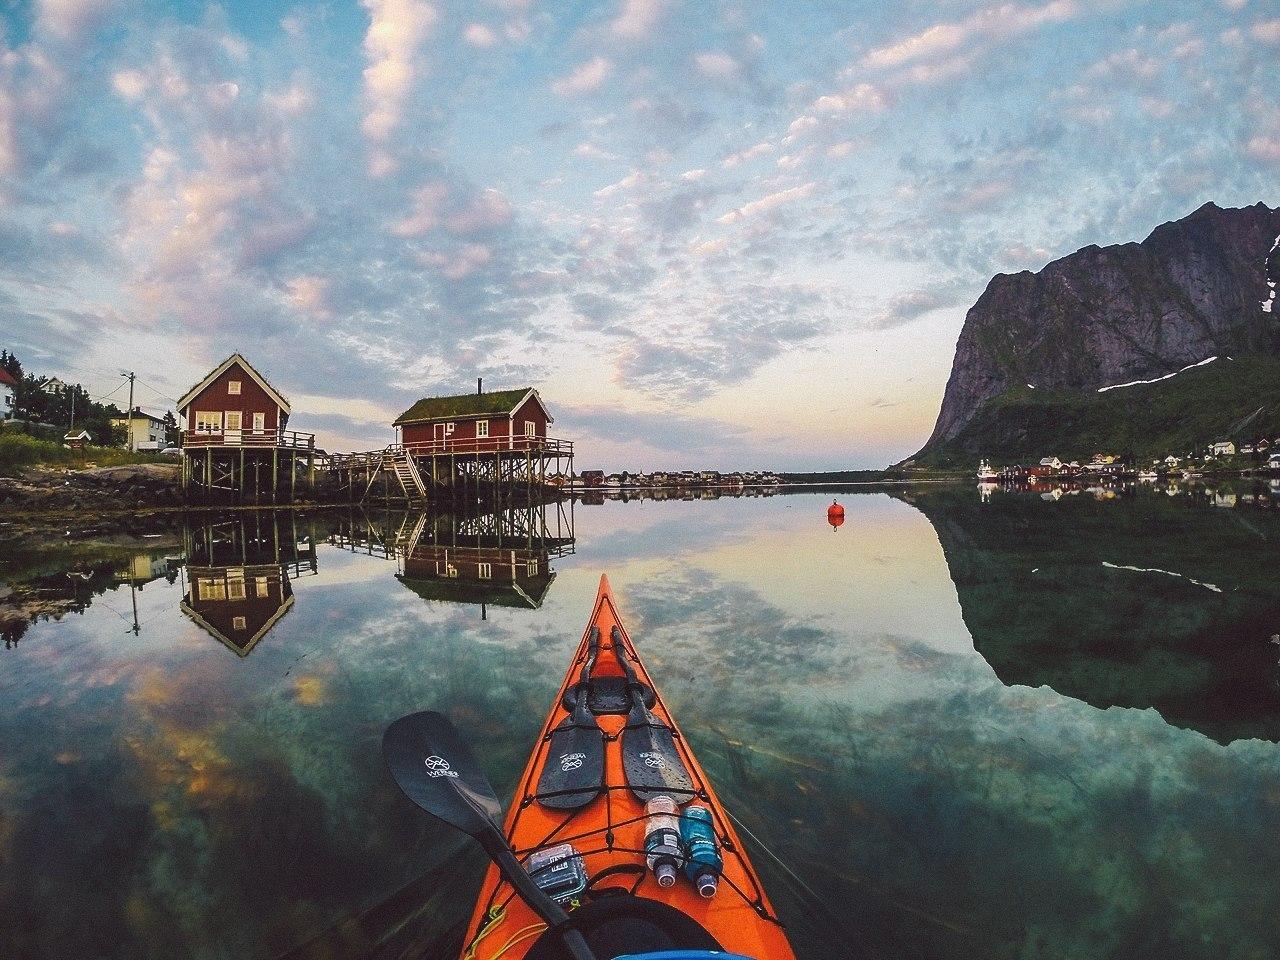 JhrdZ7DDI 8 - Норвегия - страна холодной красоты